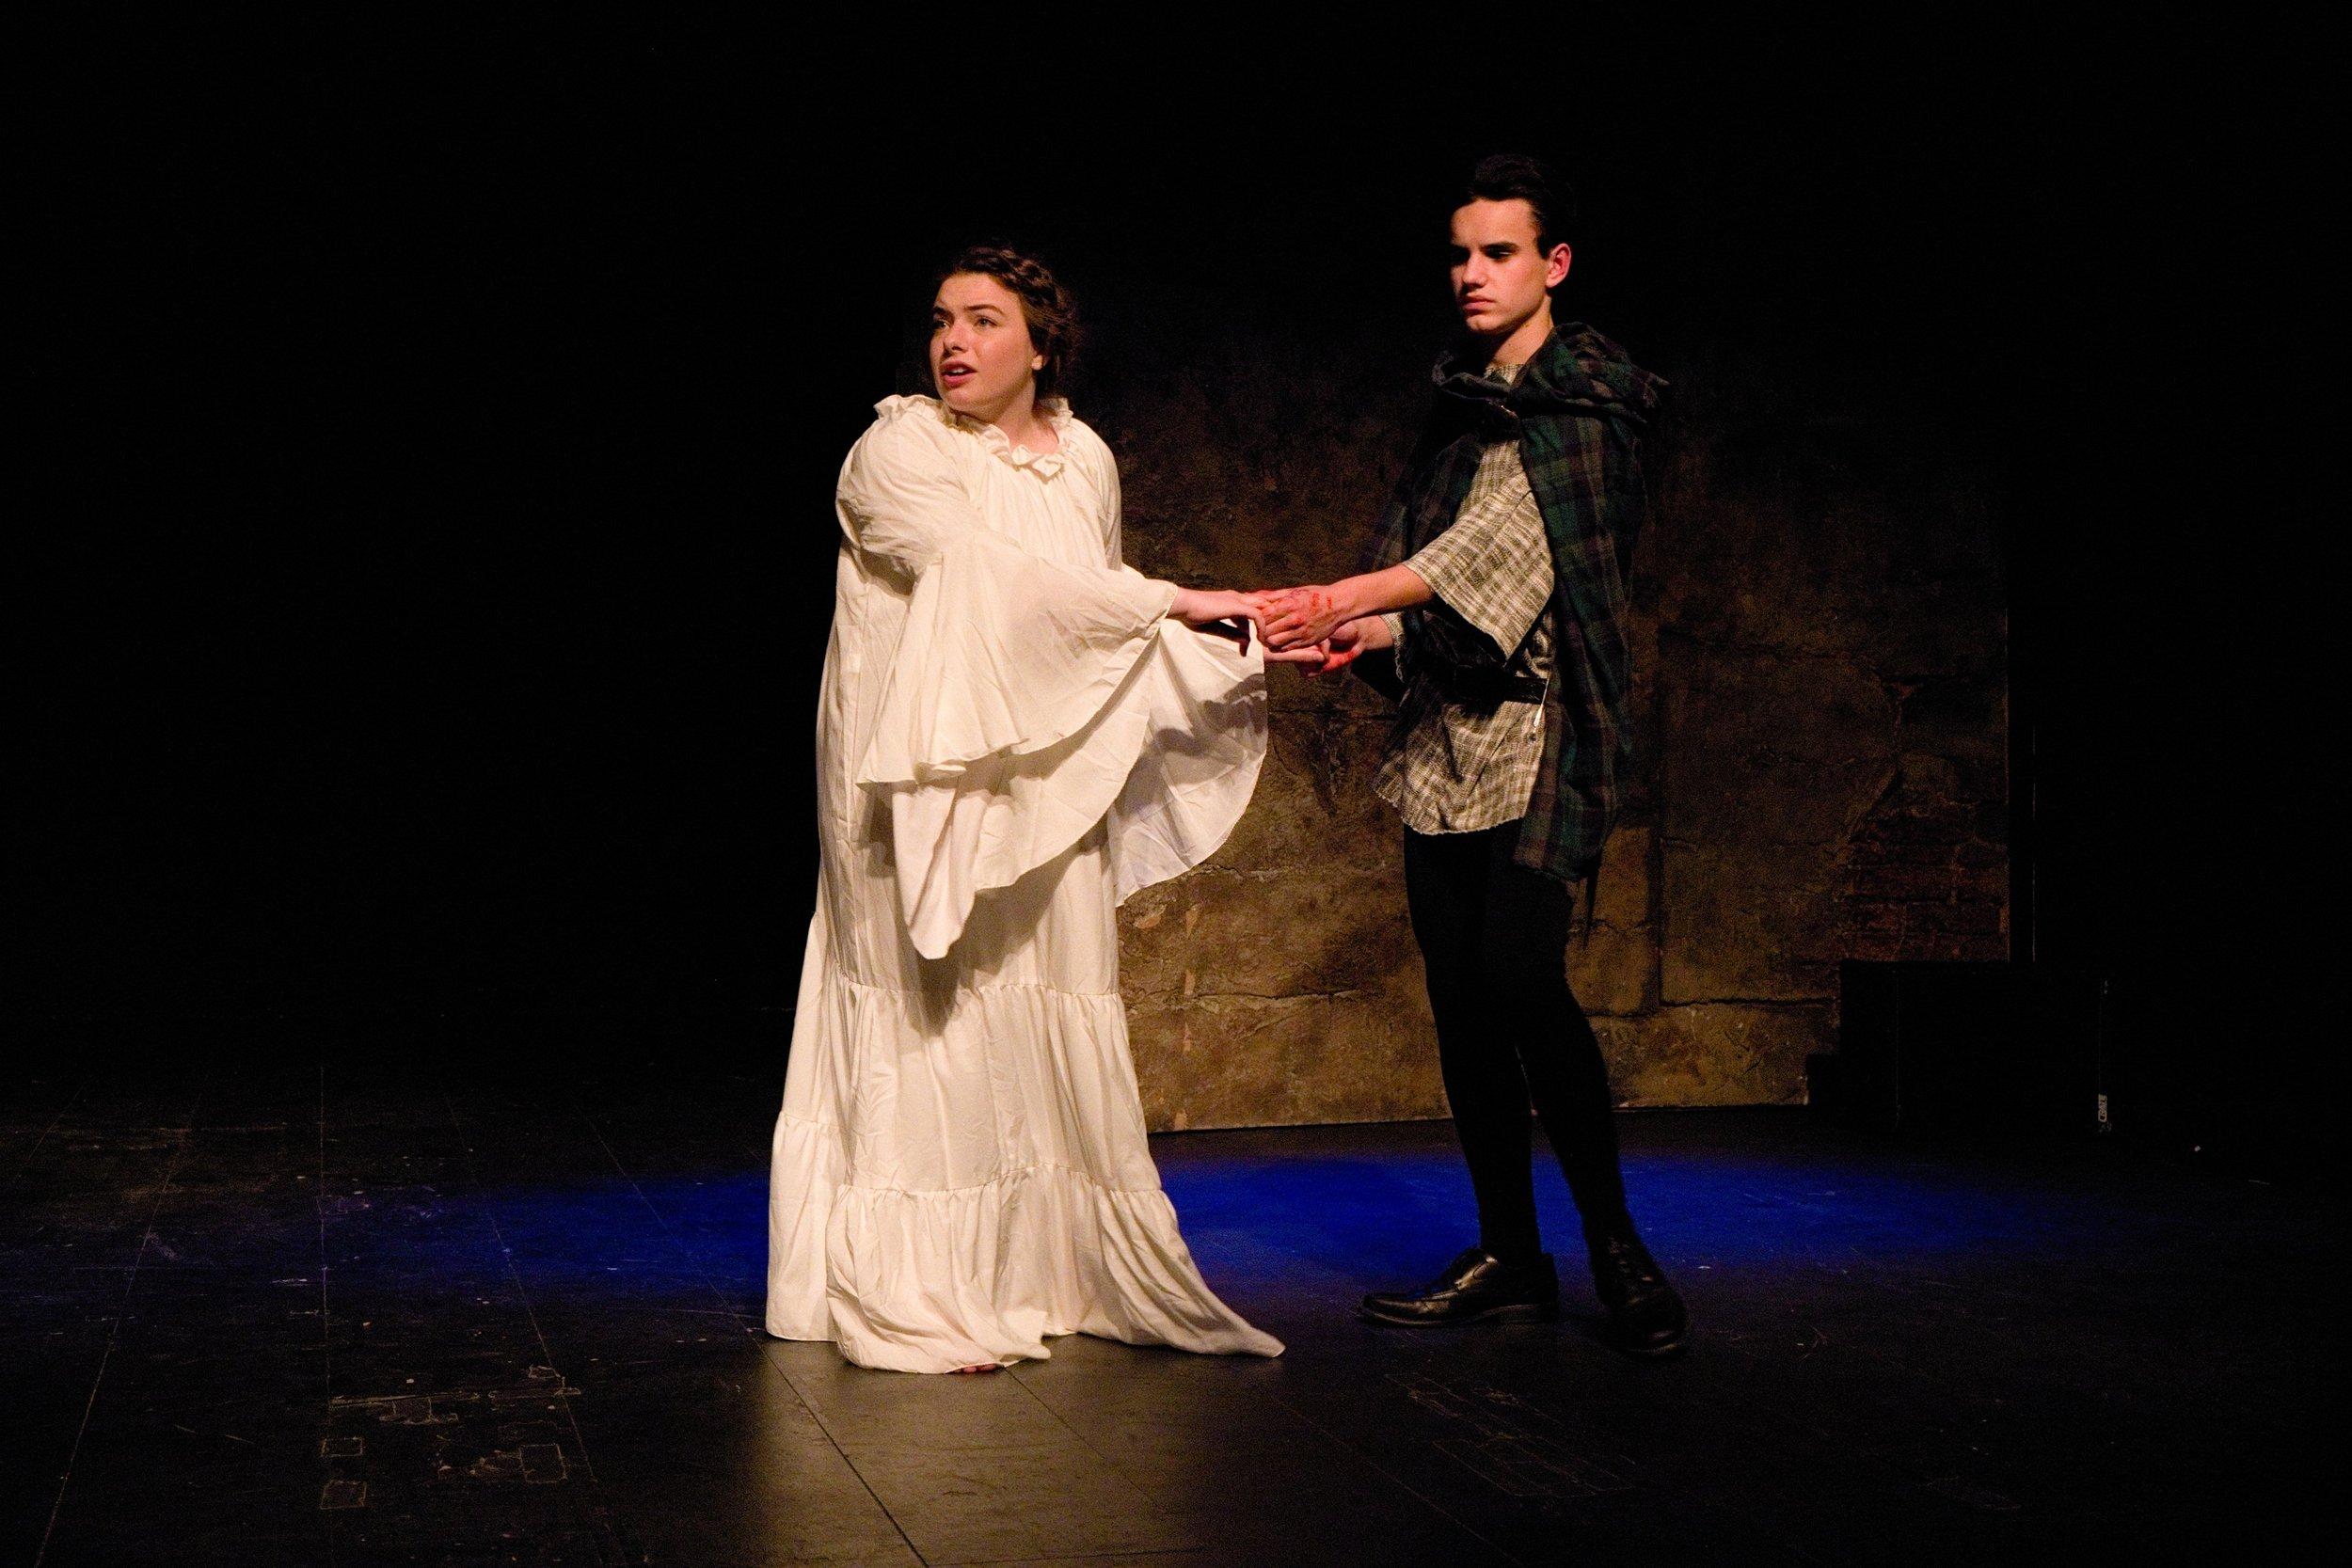 Macbeth Lady and Mr. mac.jpg